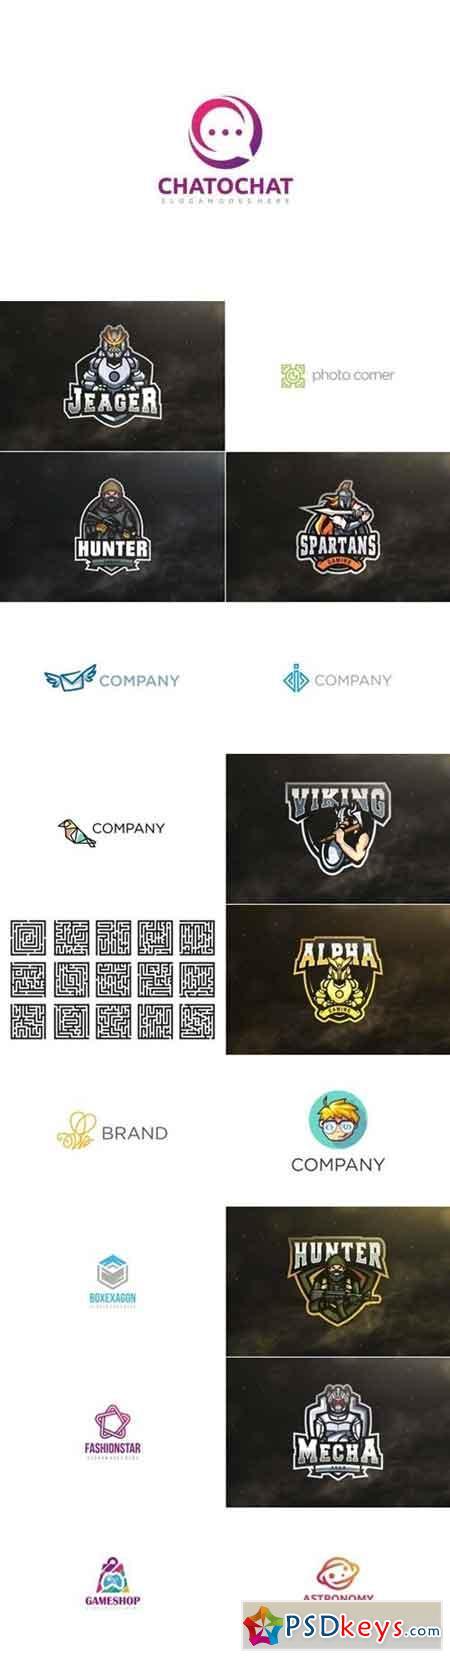 Logo Bundle 60 » Free Download Photoshop Vector Stock image